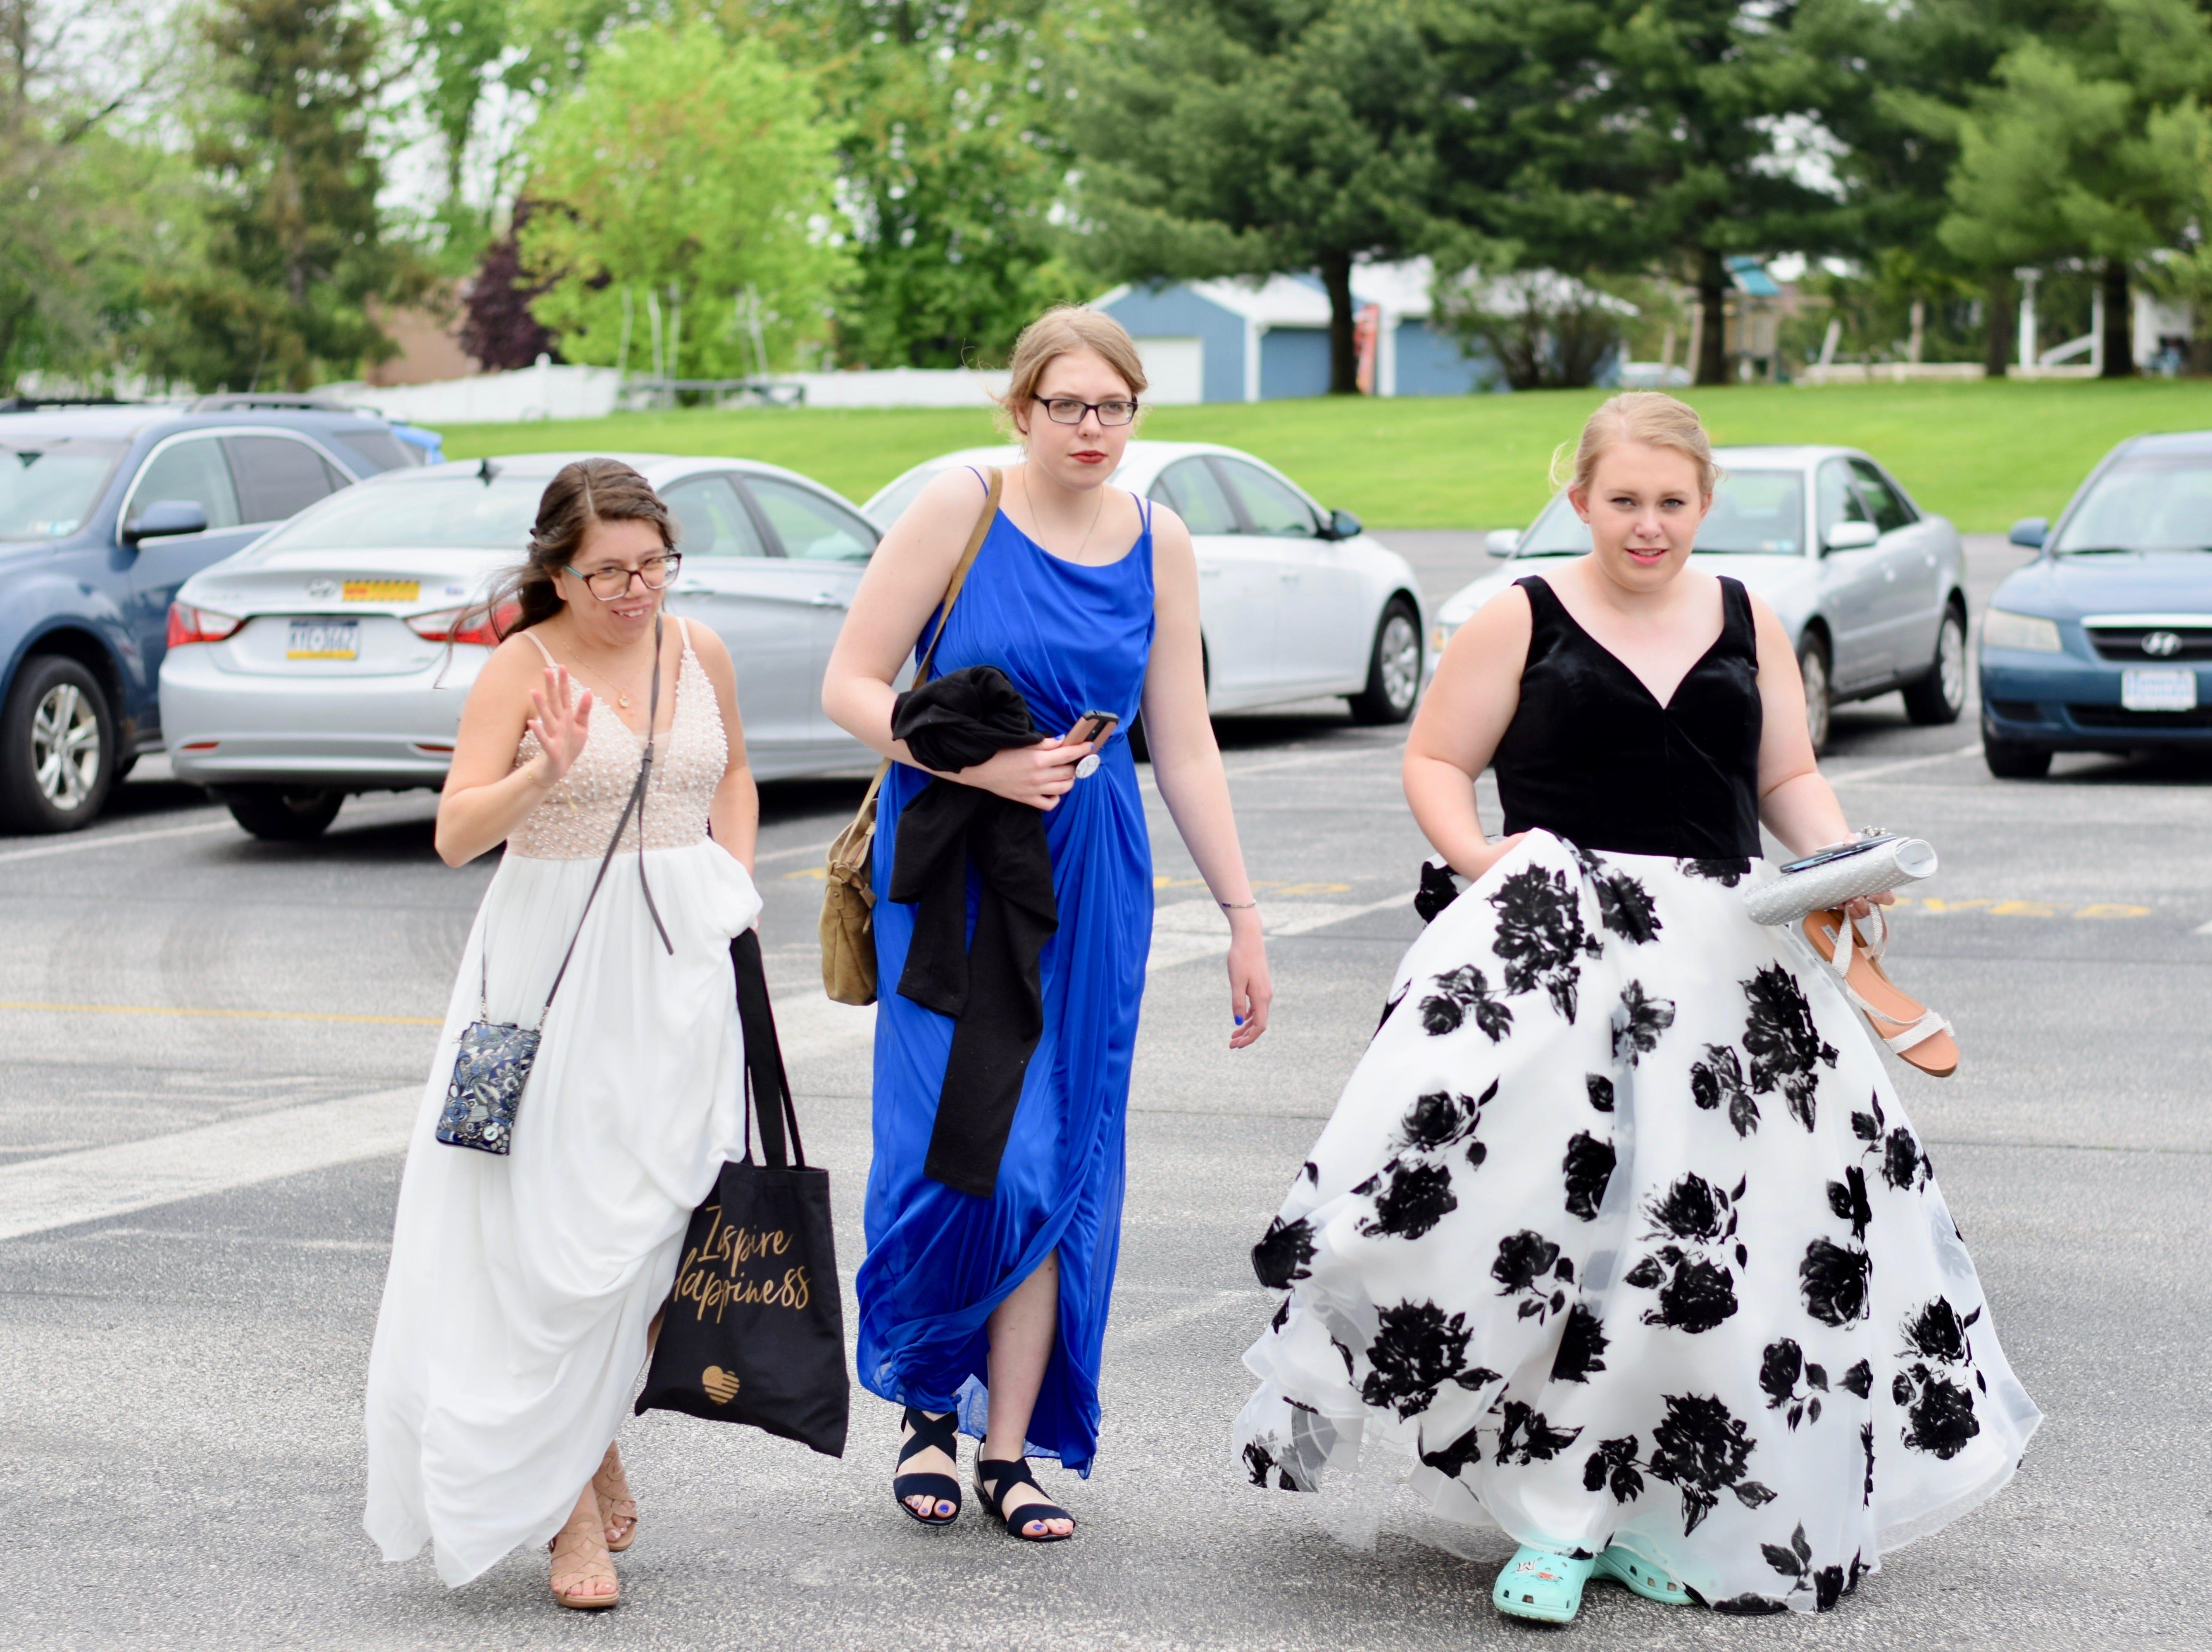 Christian School of York students held their 2019 prom Saturday, May 4. Jennifer King photo